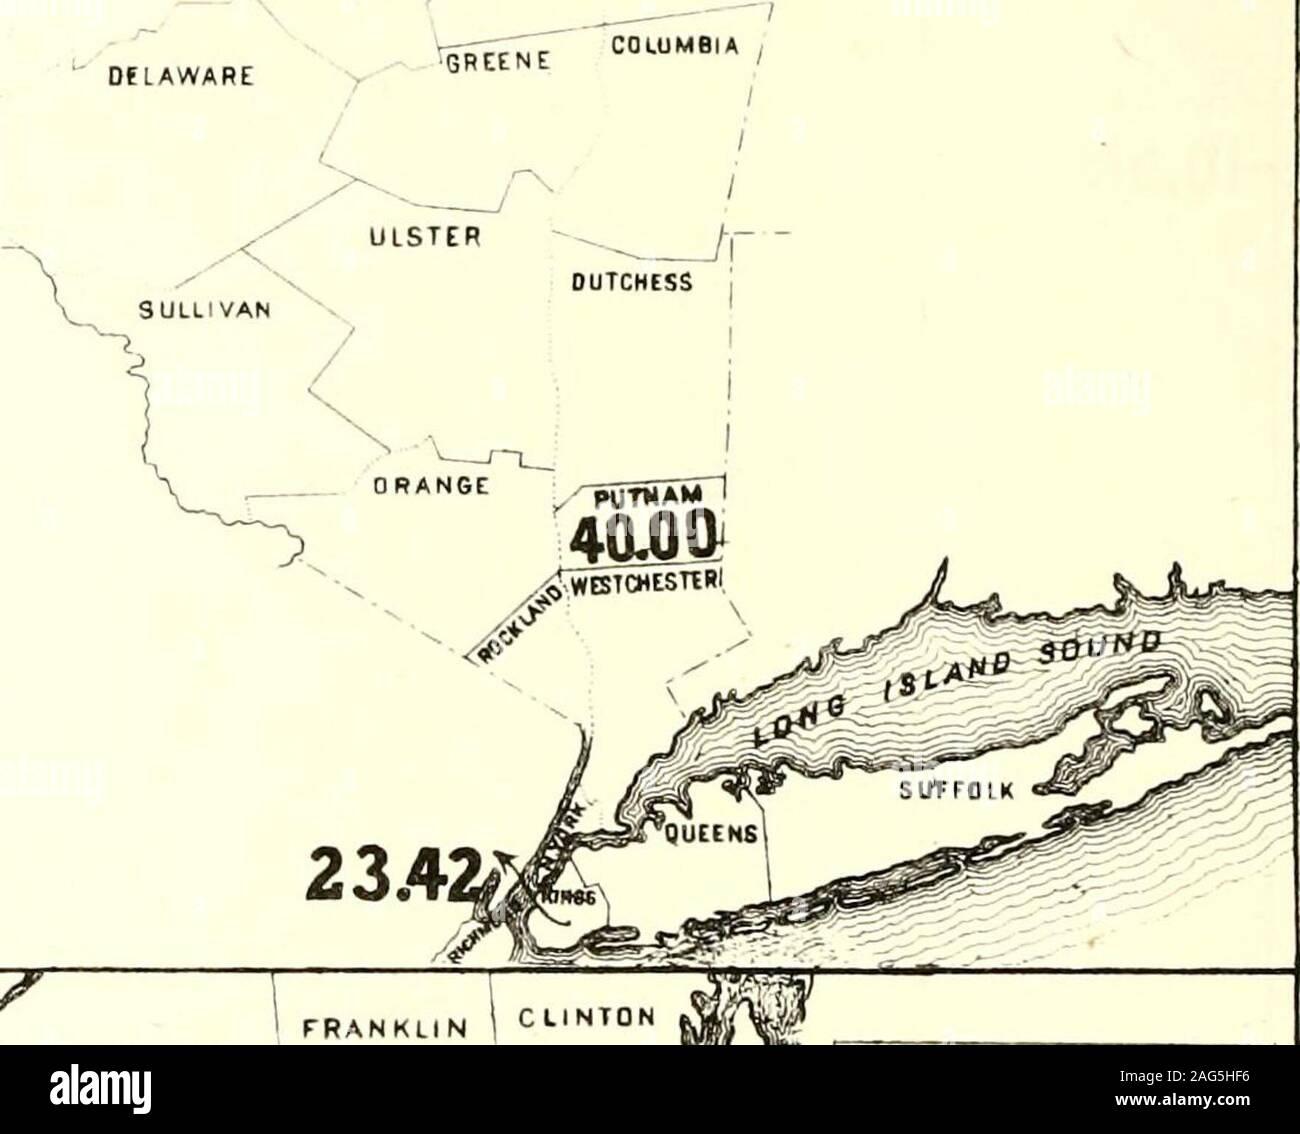 . Census of the state of New York for 1875. Counties. 1 Per Ct ! Hamilton, 1 750.00 1 Cortland, 2 77.59 i Essex, 3 60.00 1 Steuben, 4 45.00 Putnam, s 40.00 : Orleans, 6 38.95 Franklin, 7 33,33 Lewfs, 8 29.82 Warren, 9 28.12 1 Kings, 10 23 42 , Schoharie, 11 23.12 ! Livingston, 12 20.47 Monroe, 13 19.01 Onondaga, 14 16.81 : Broome, * li.18 CATTARAUGJS ALLE8AHY iXHAUTAUQUAl STEUBEN --^^ 45.00 fATES TOMPKIHS 17^53 CHENANSO SCHOMAniE-. -r ALBANY 23.12 CHEMUNG 15.18 DflAWARE MAP No.I. £ X P LA N AT ION . Till Ilifiiris III 1(1,/i ((III II ty sli (>l llir rt/lixilniolrs II tJtriii/.vf in.-i/nii/ Stock Photo